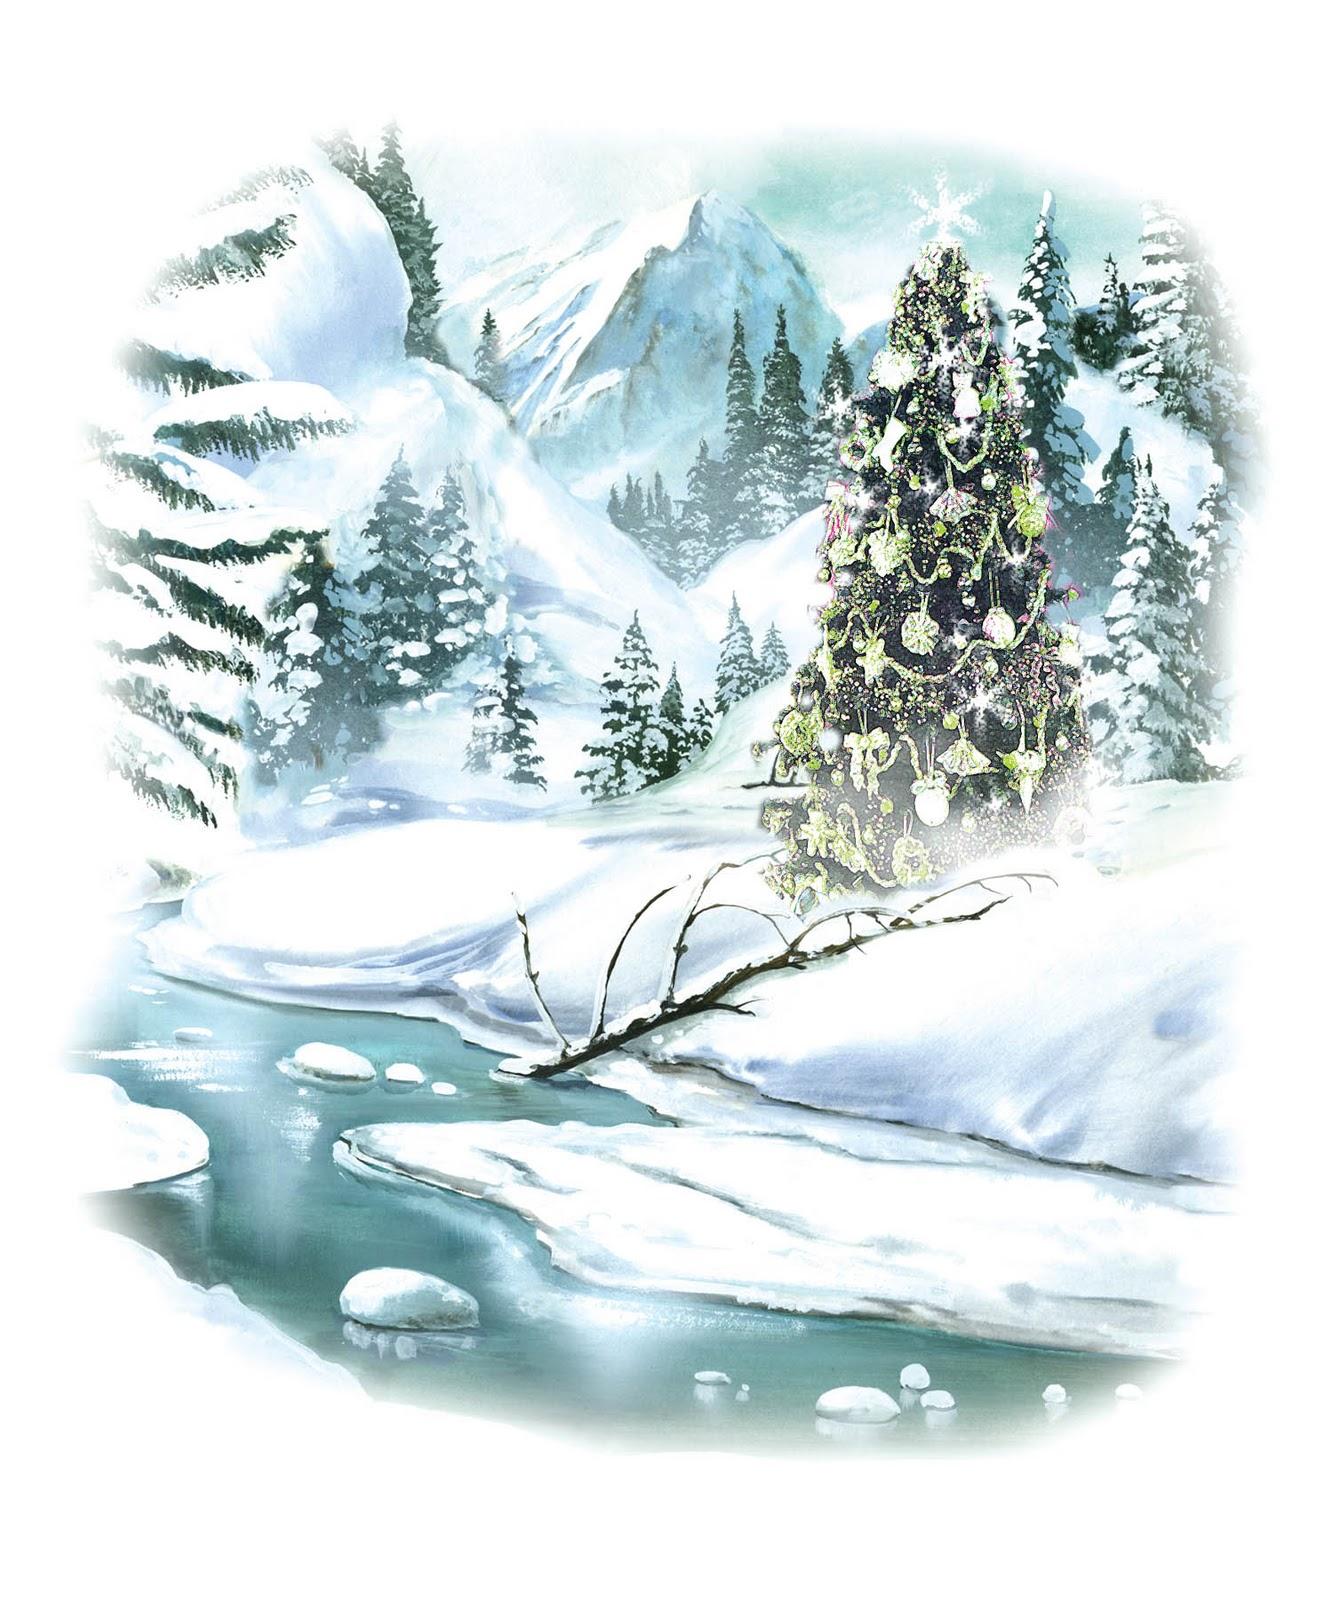 hight resolution of snowy xmas scene